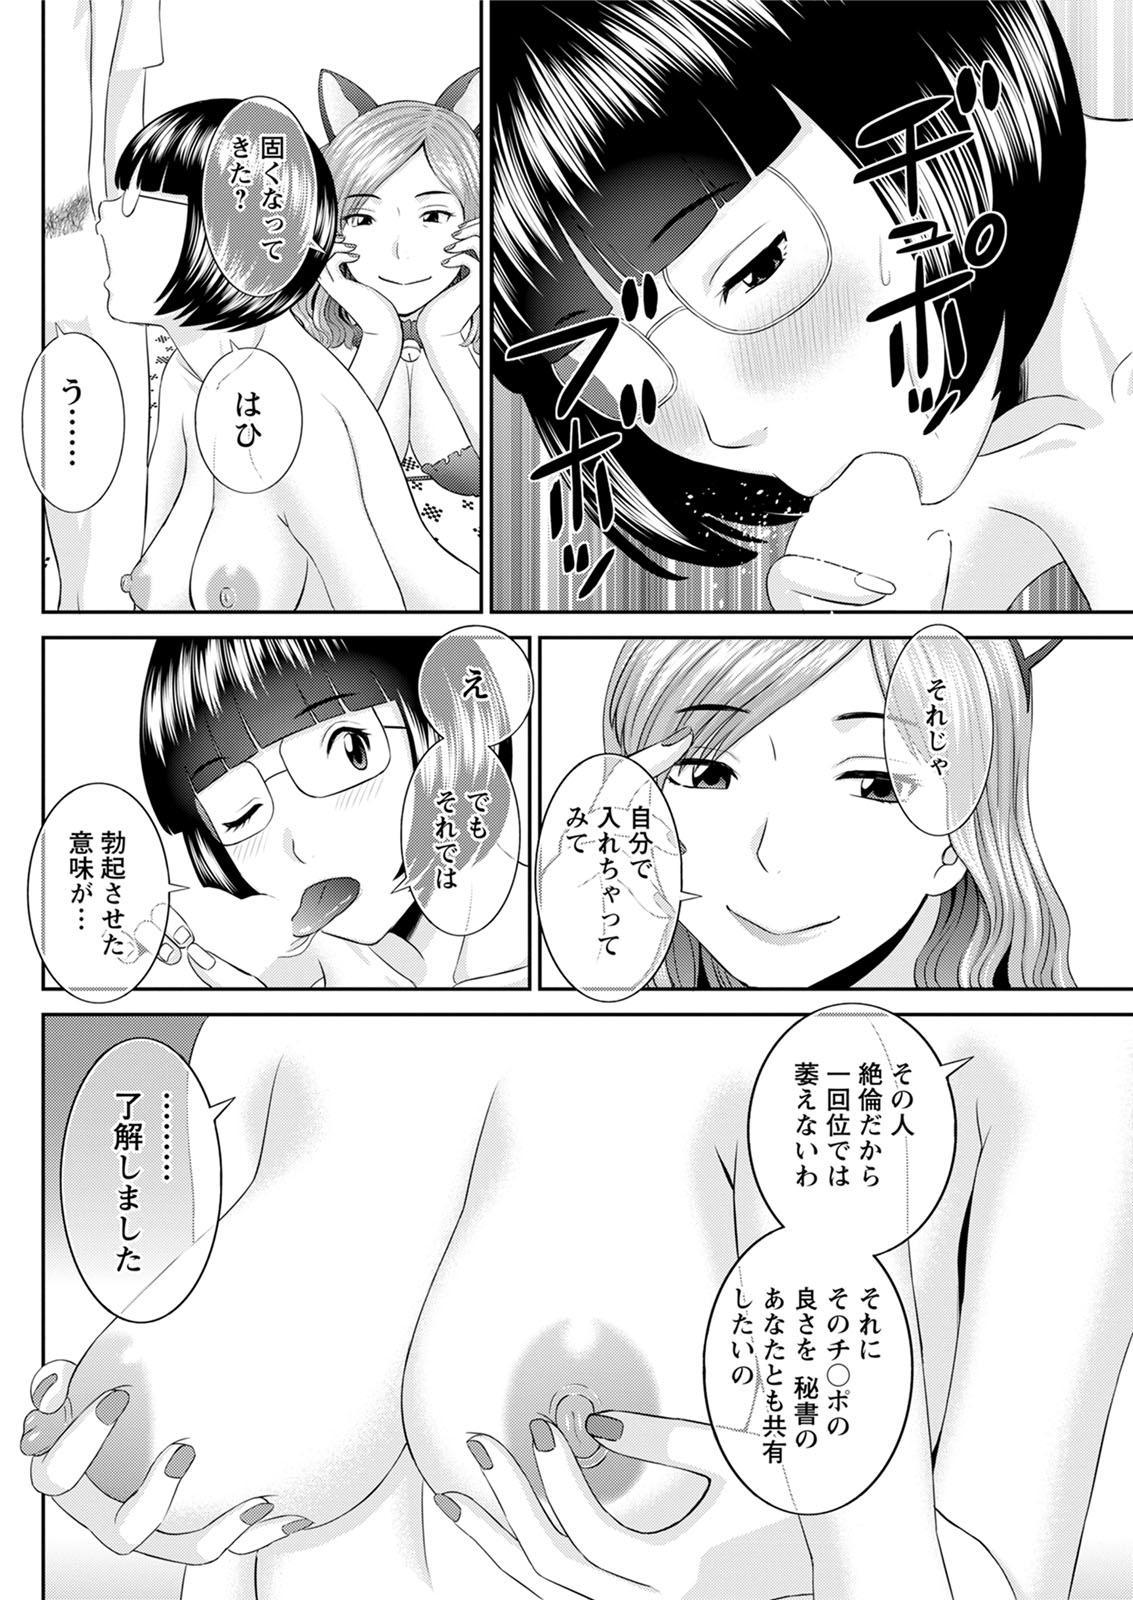 [Kawamori Misaki] Kaikan Hitotsuma Gakuen Ch. 1-6, 8-20 [Digital] 248